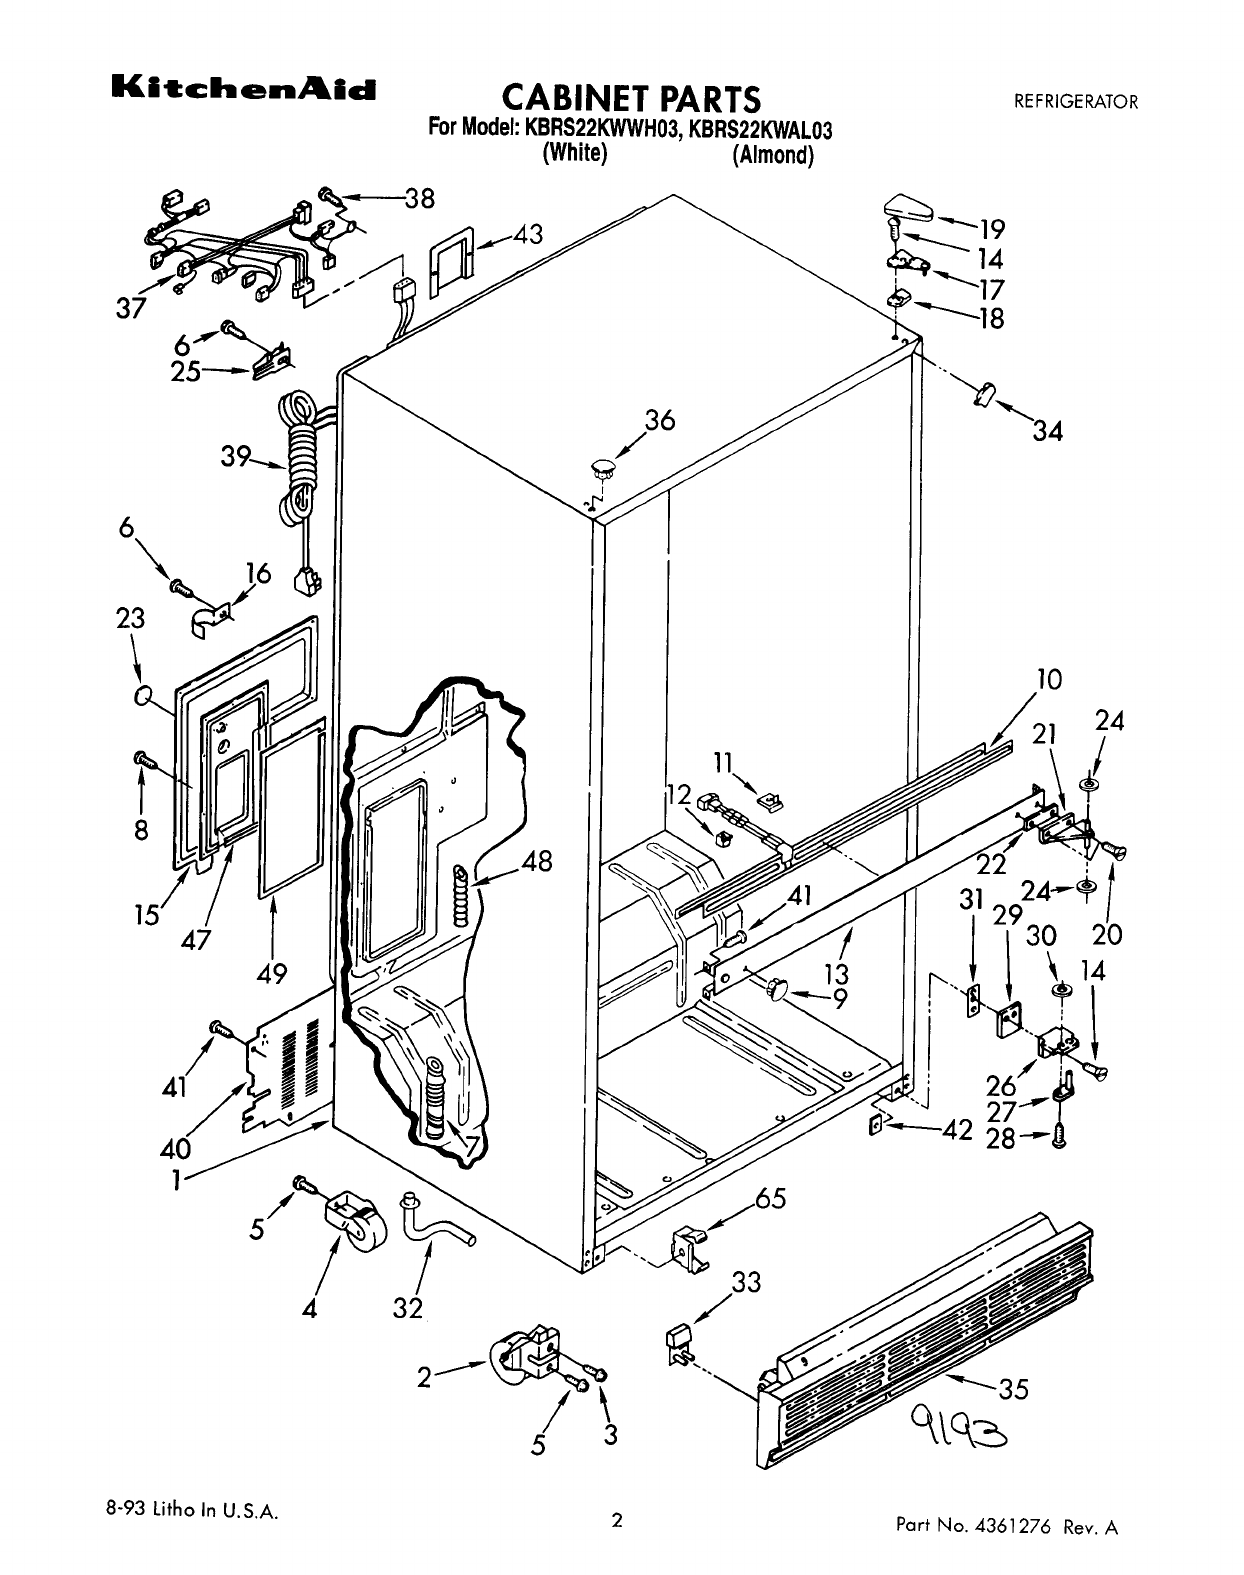 Kitchenaid Superba Refrigerator Repair Manual. Feels free